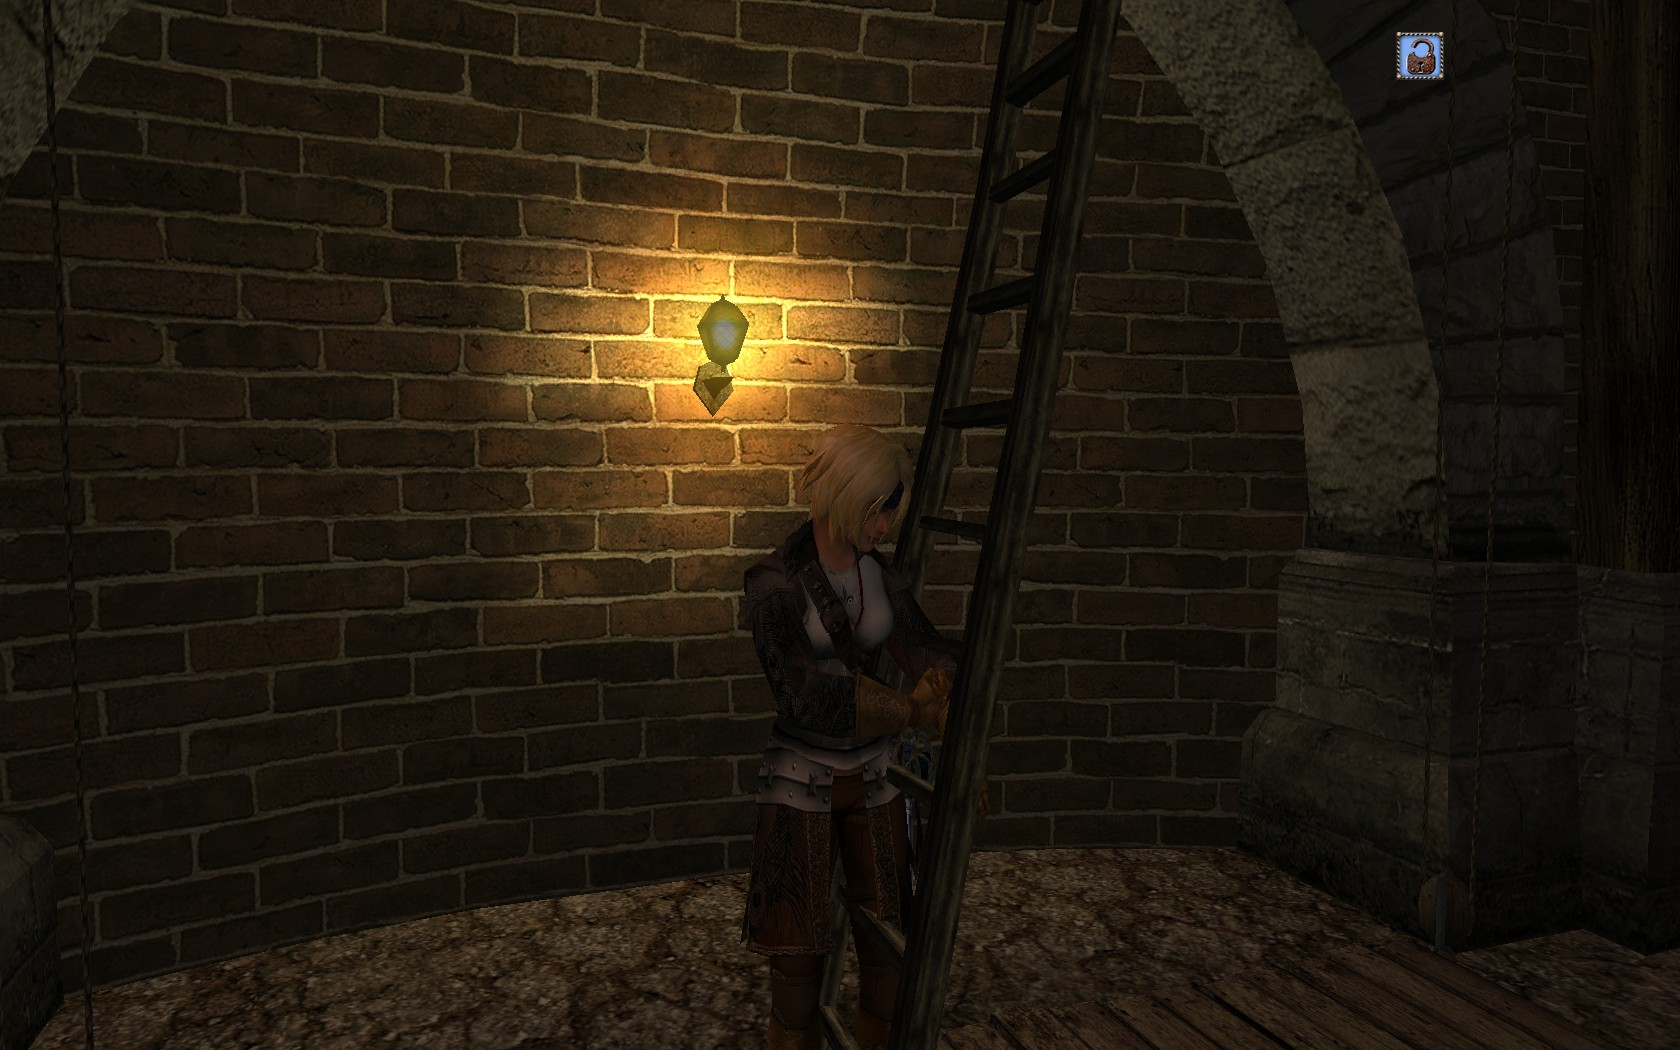 ladder4.jpg - -